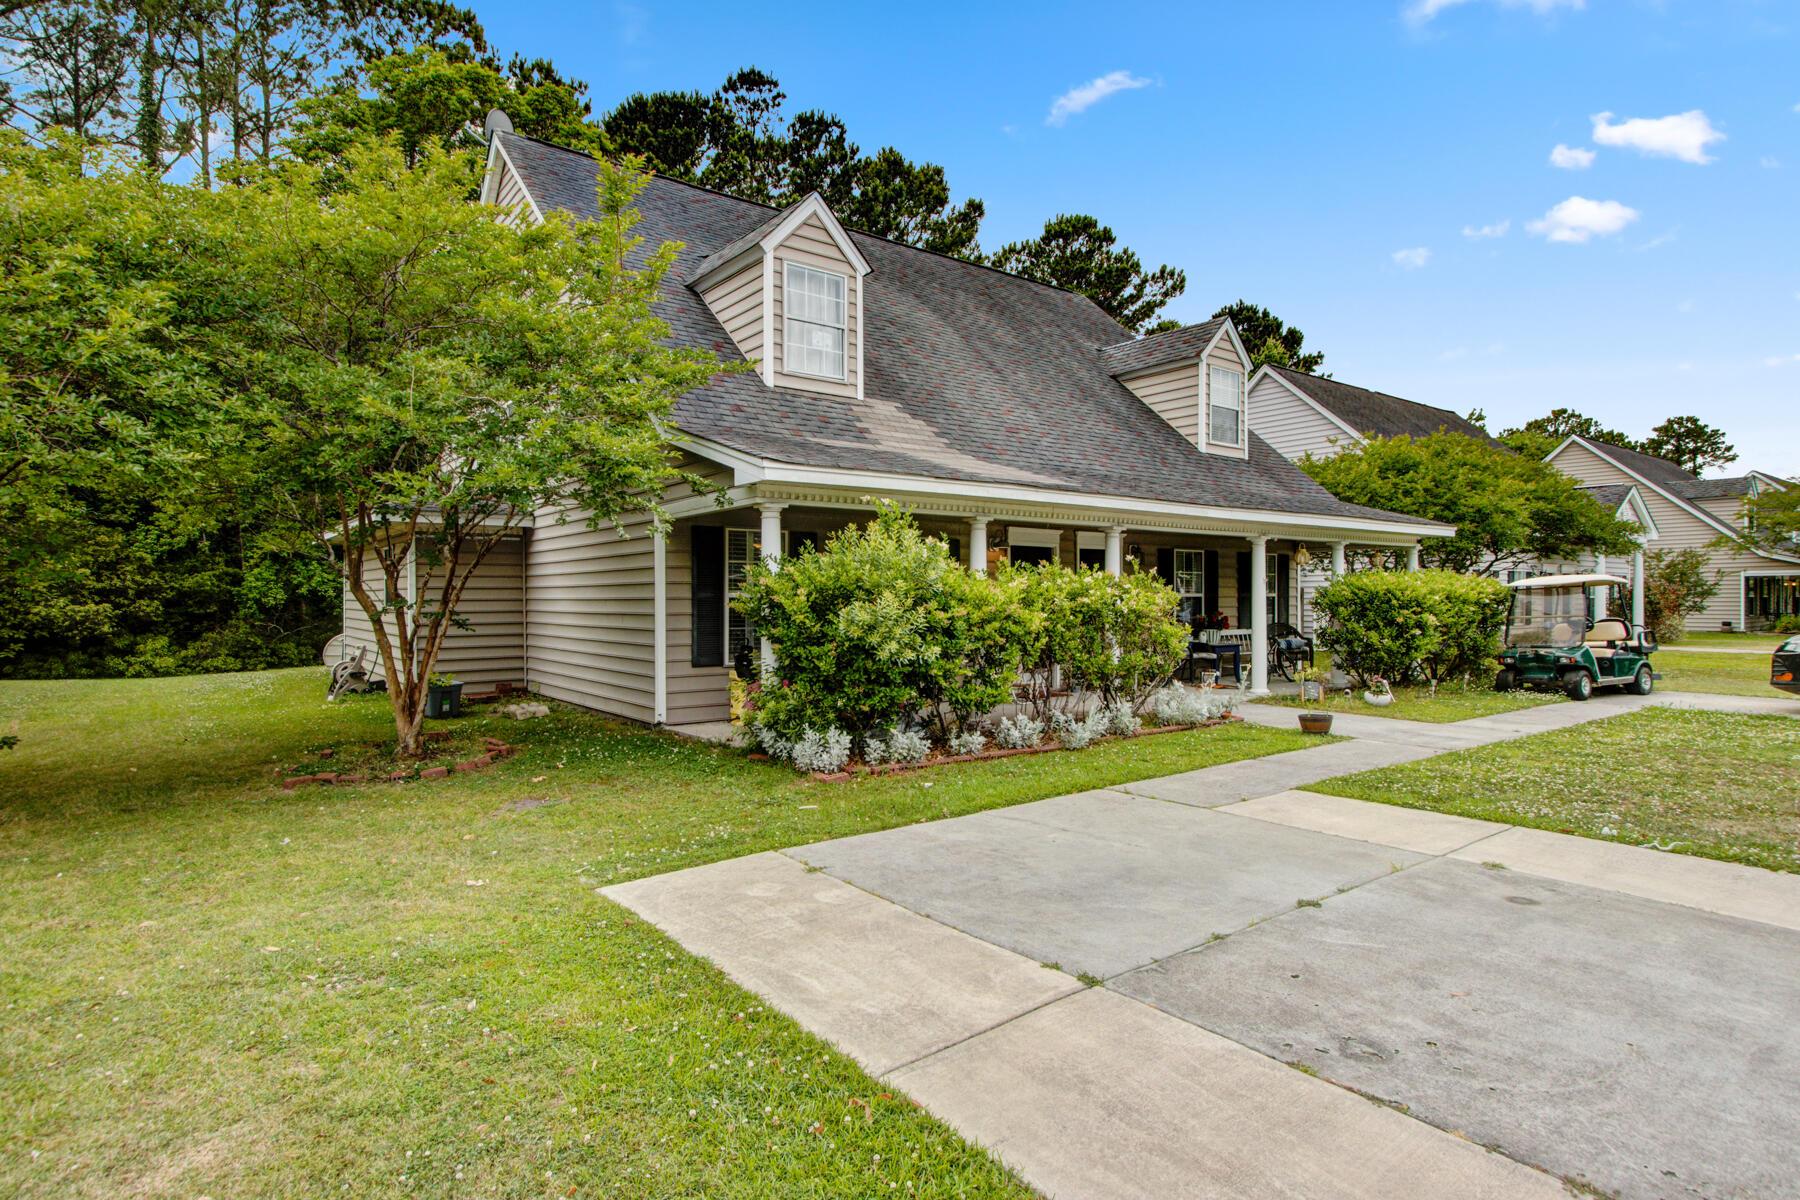 Dunes West Homes For Sale - 2232 Kings Gate, Mount Pleasant, SC - 26